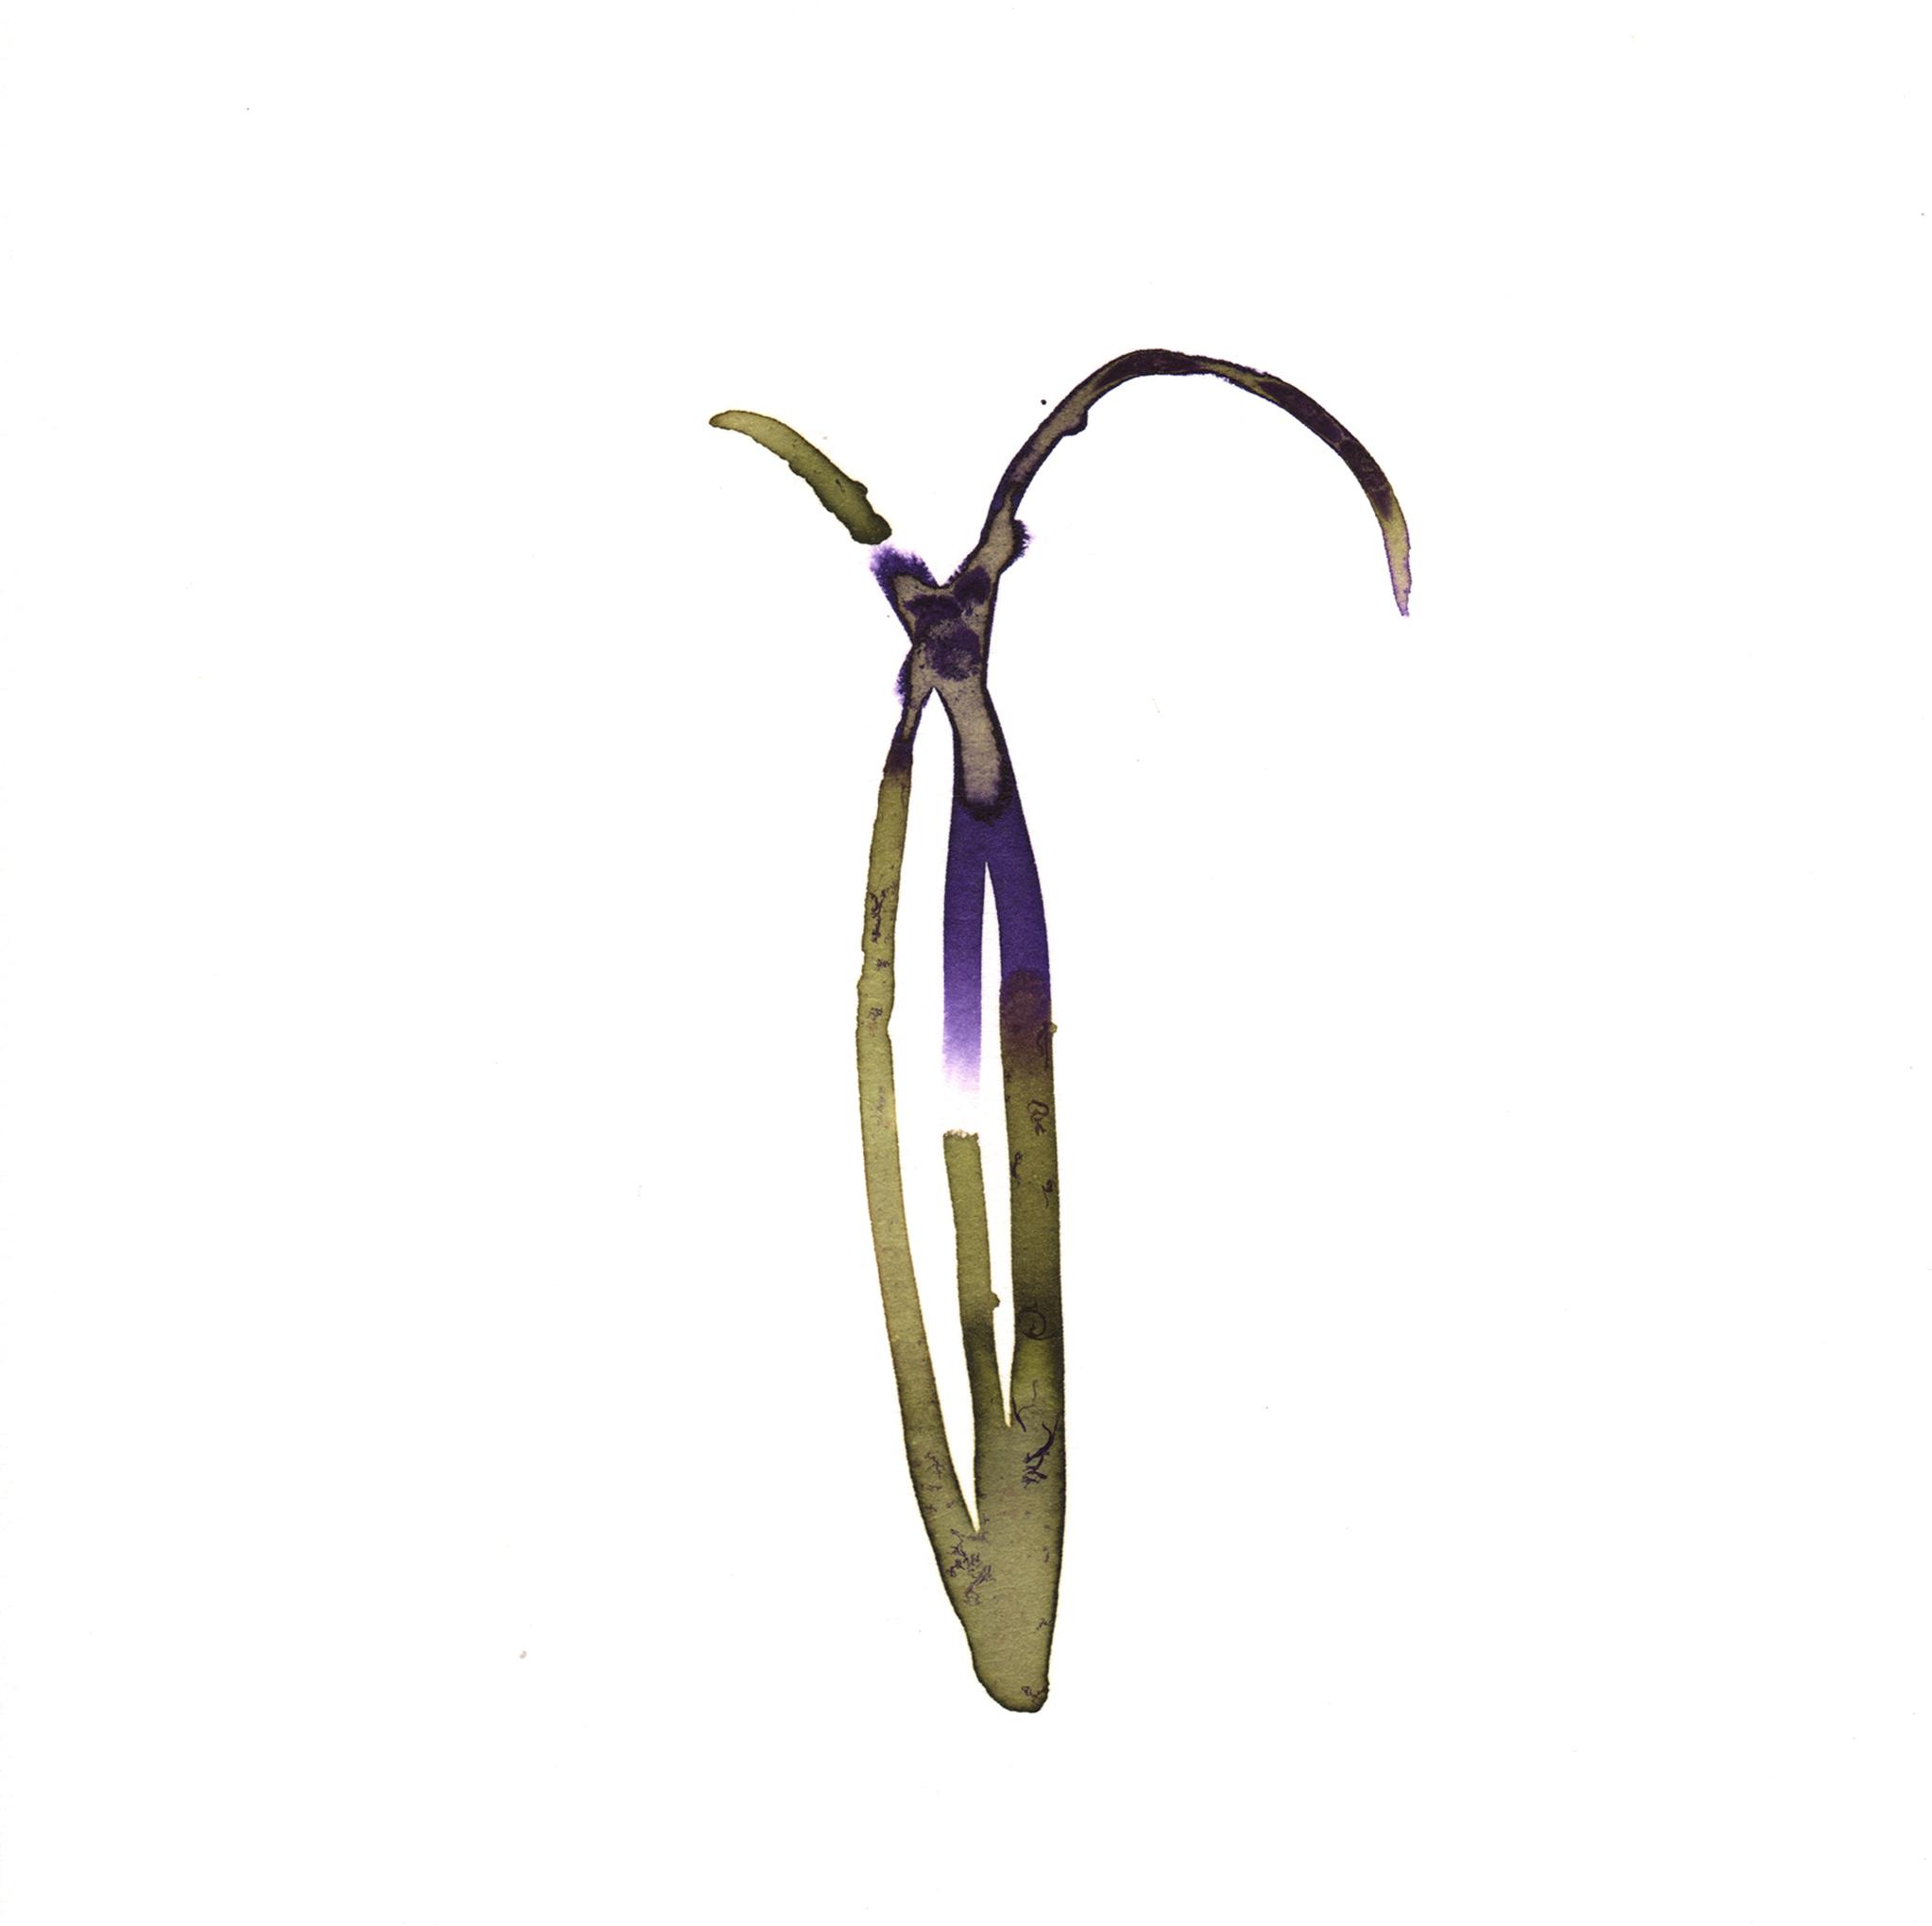 188.Wild.Grass.8.15.14.jpg